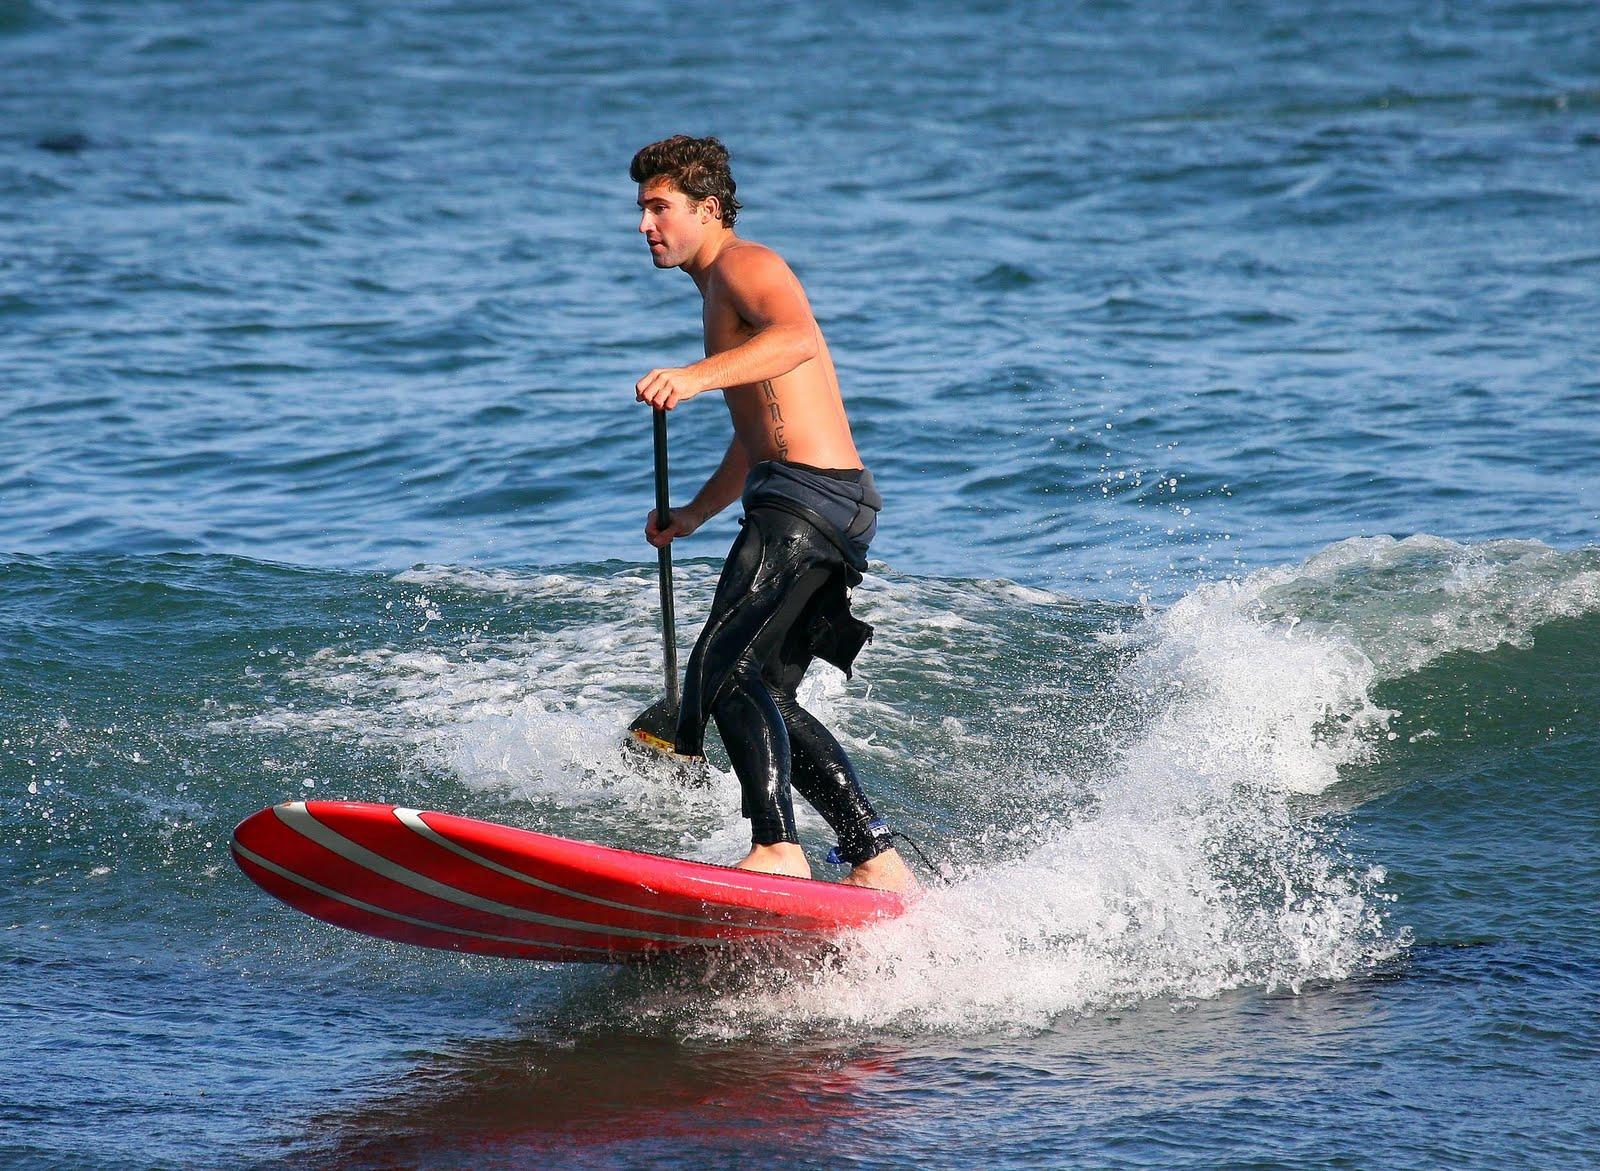 http://1.bp.blogspot.com/_GgQtqLiRv-8/S9Bqcq4AilI/AAAAAAAAfAc/EQZRCGKdohY/s1600/BrodyJenner-surfing-11.jpg